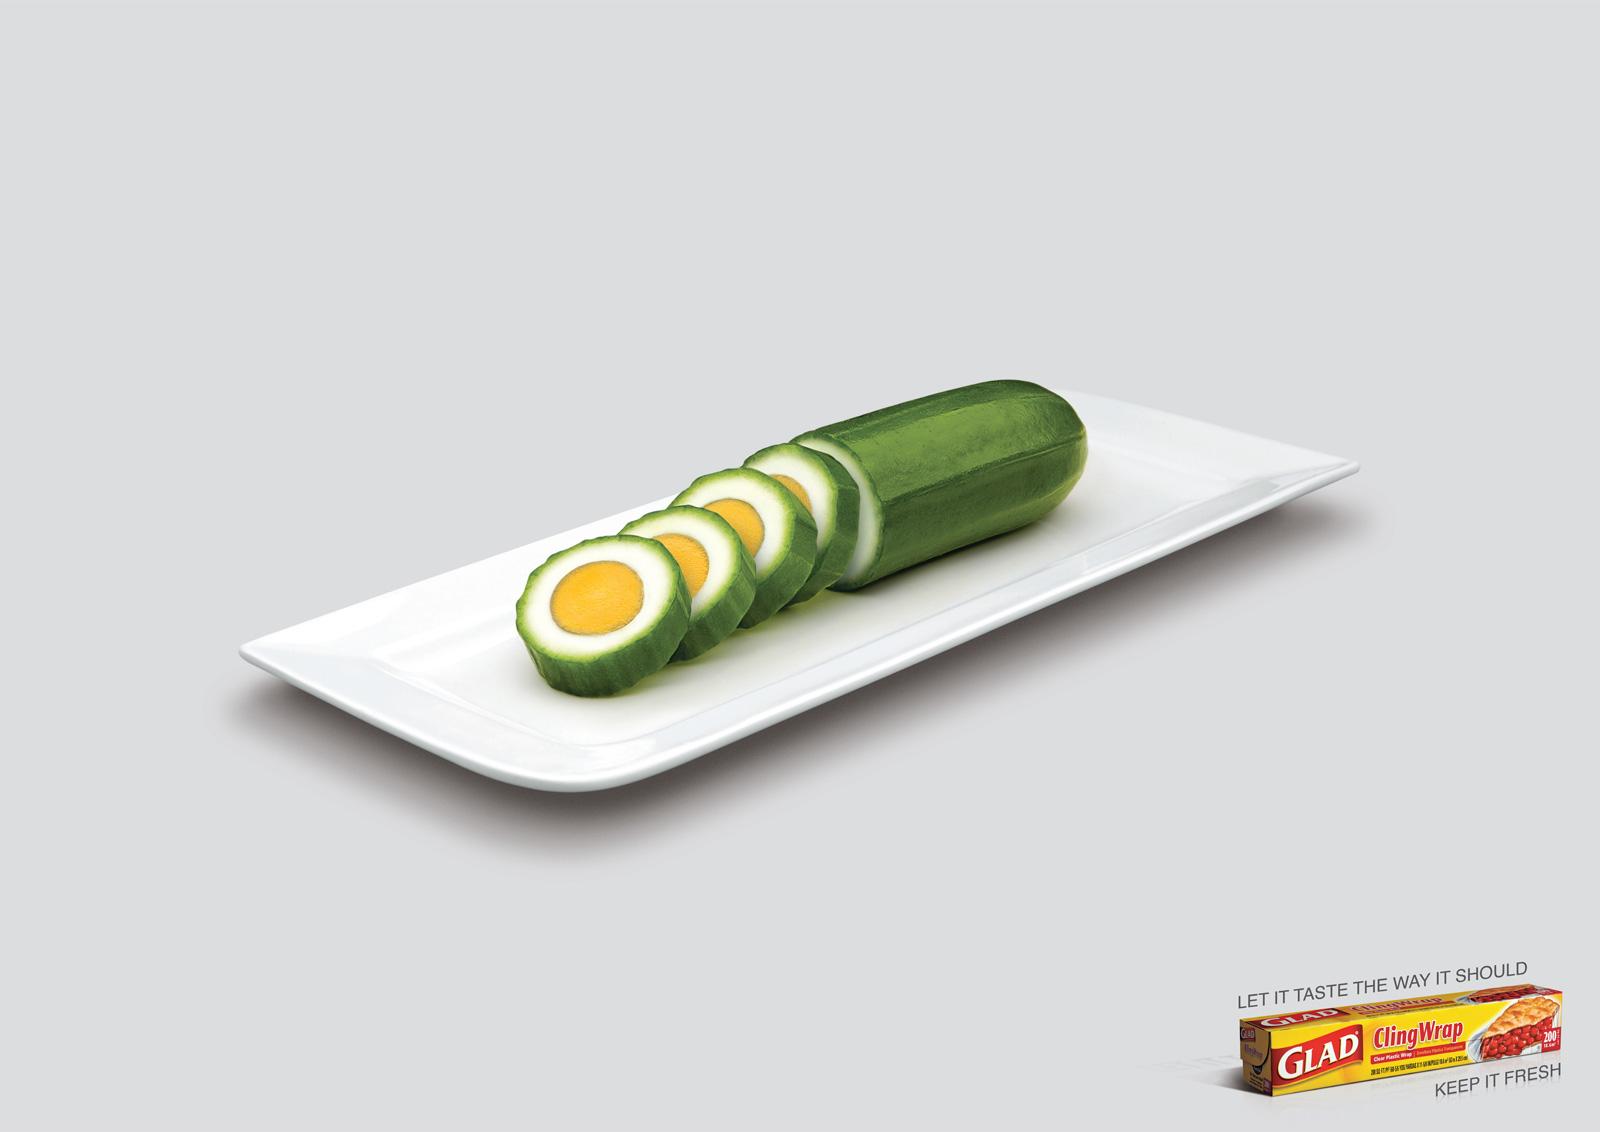 http//www.ibelieveinadv.com/commons2/glad_cucumber_1.jpg